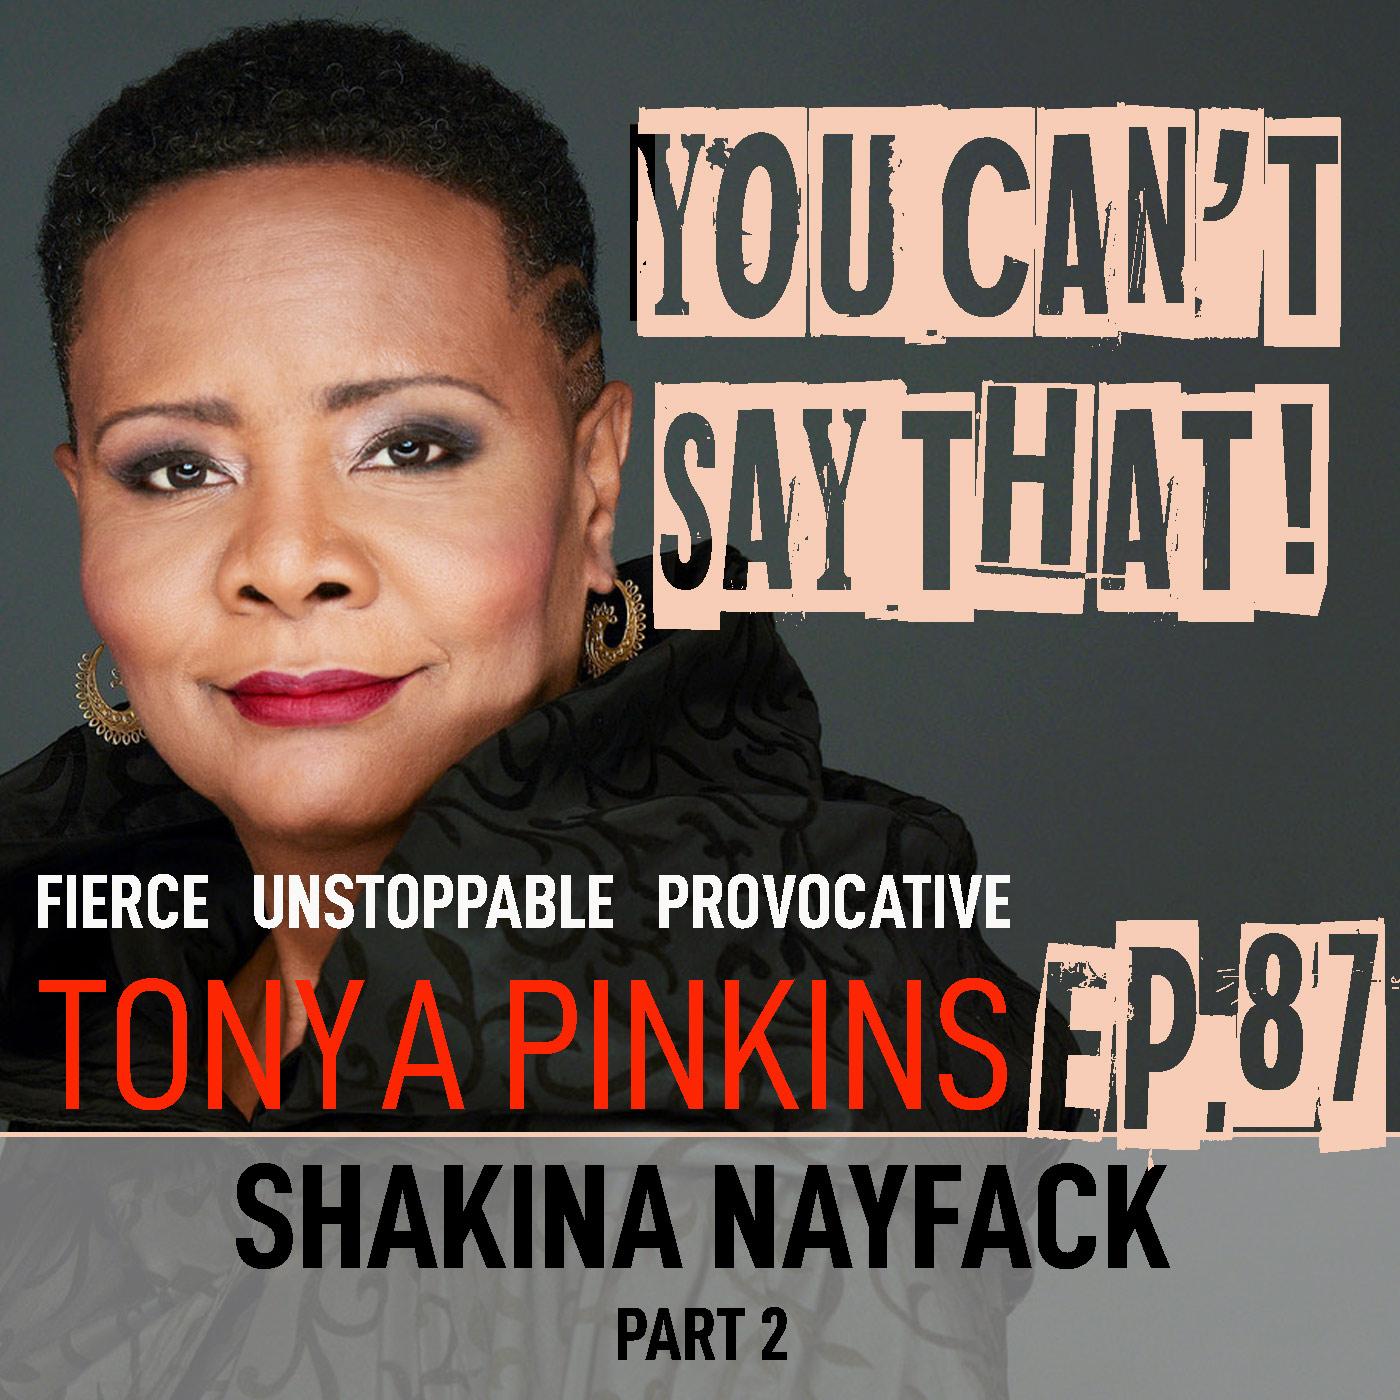 You Can't Say That Tonya Pinkins Ep87 - Shakina Nayfack (Part 2)